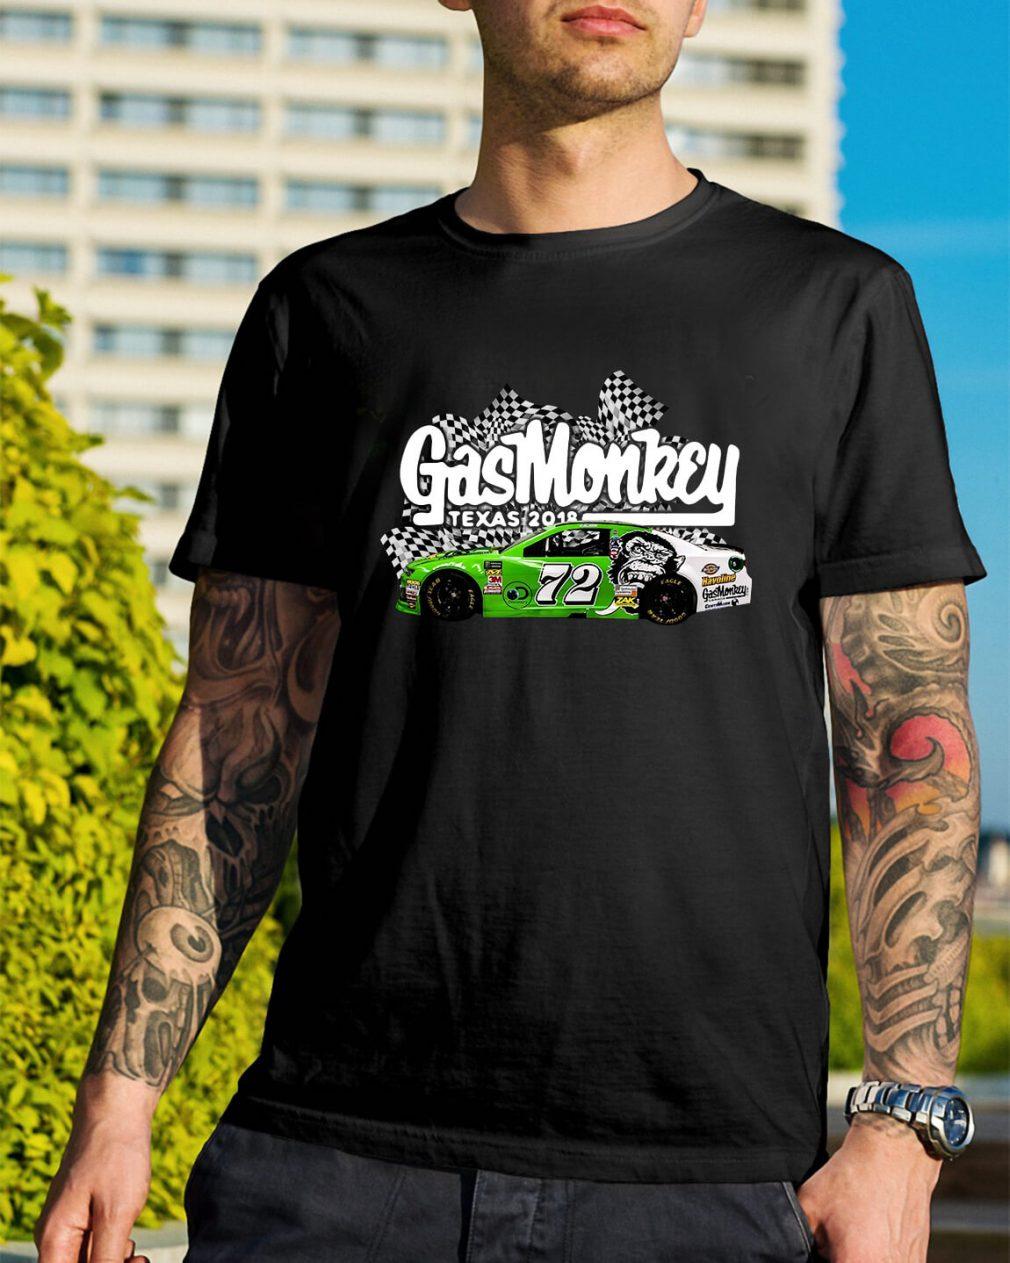 Gas Monkey Texas 2018 shirt